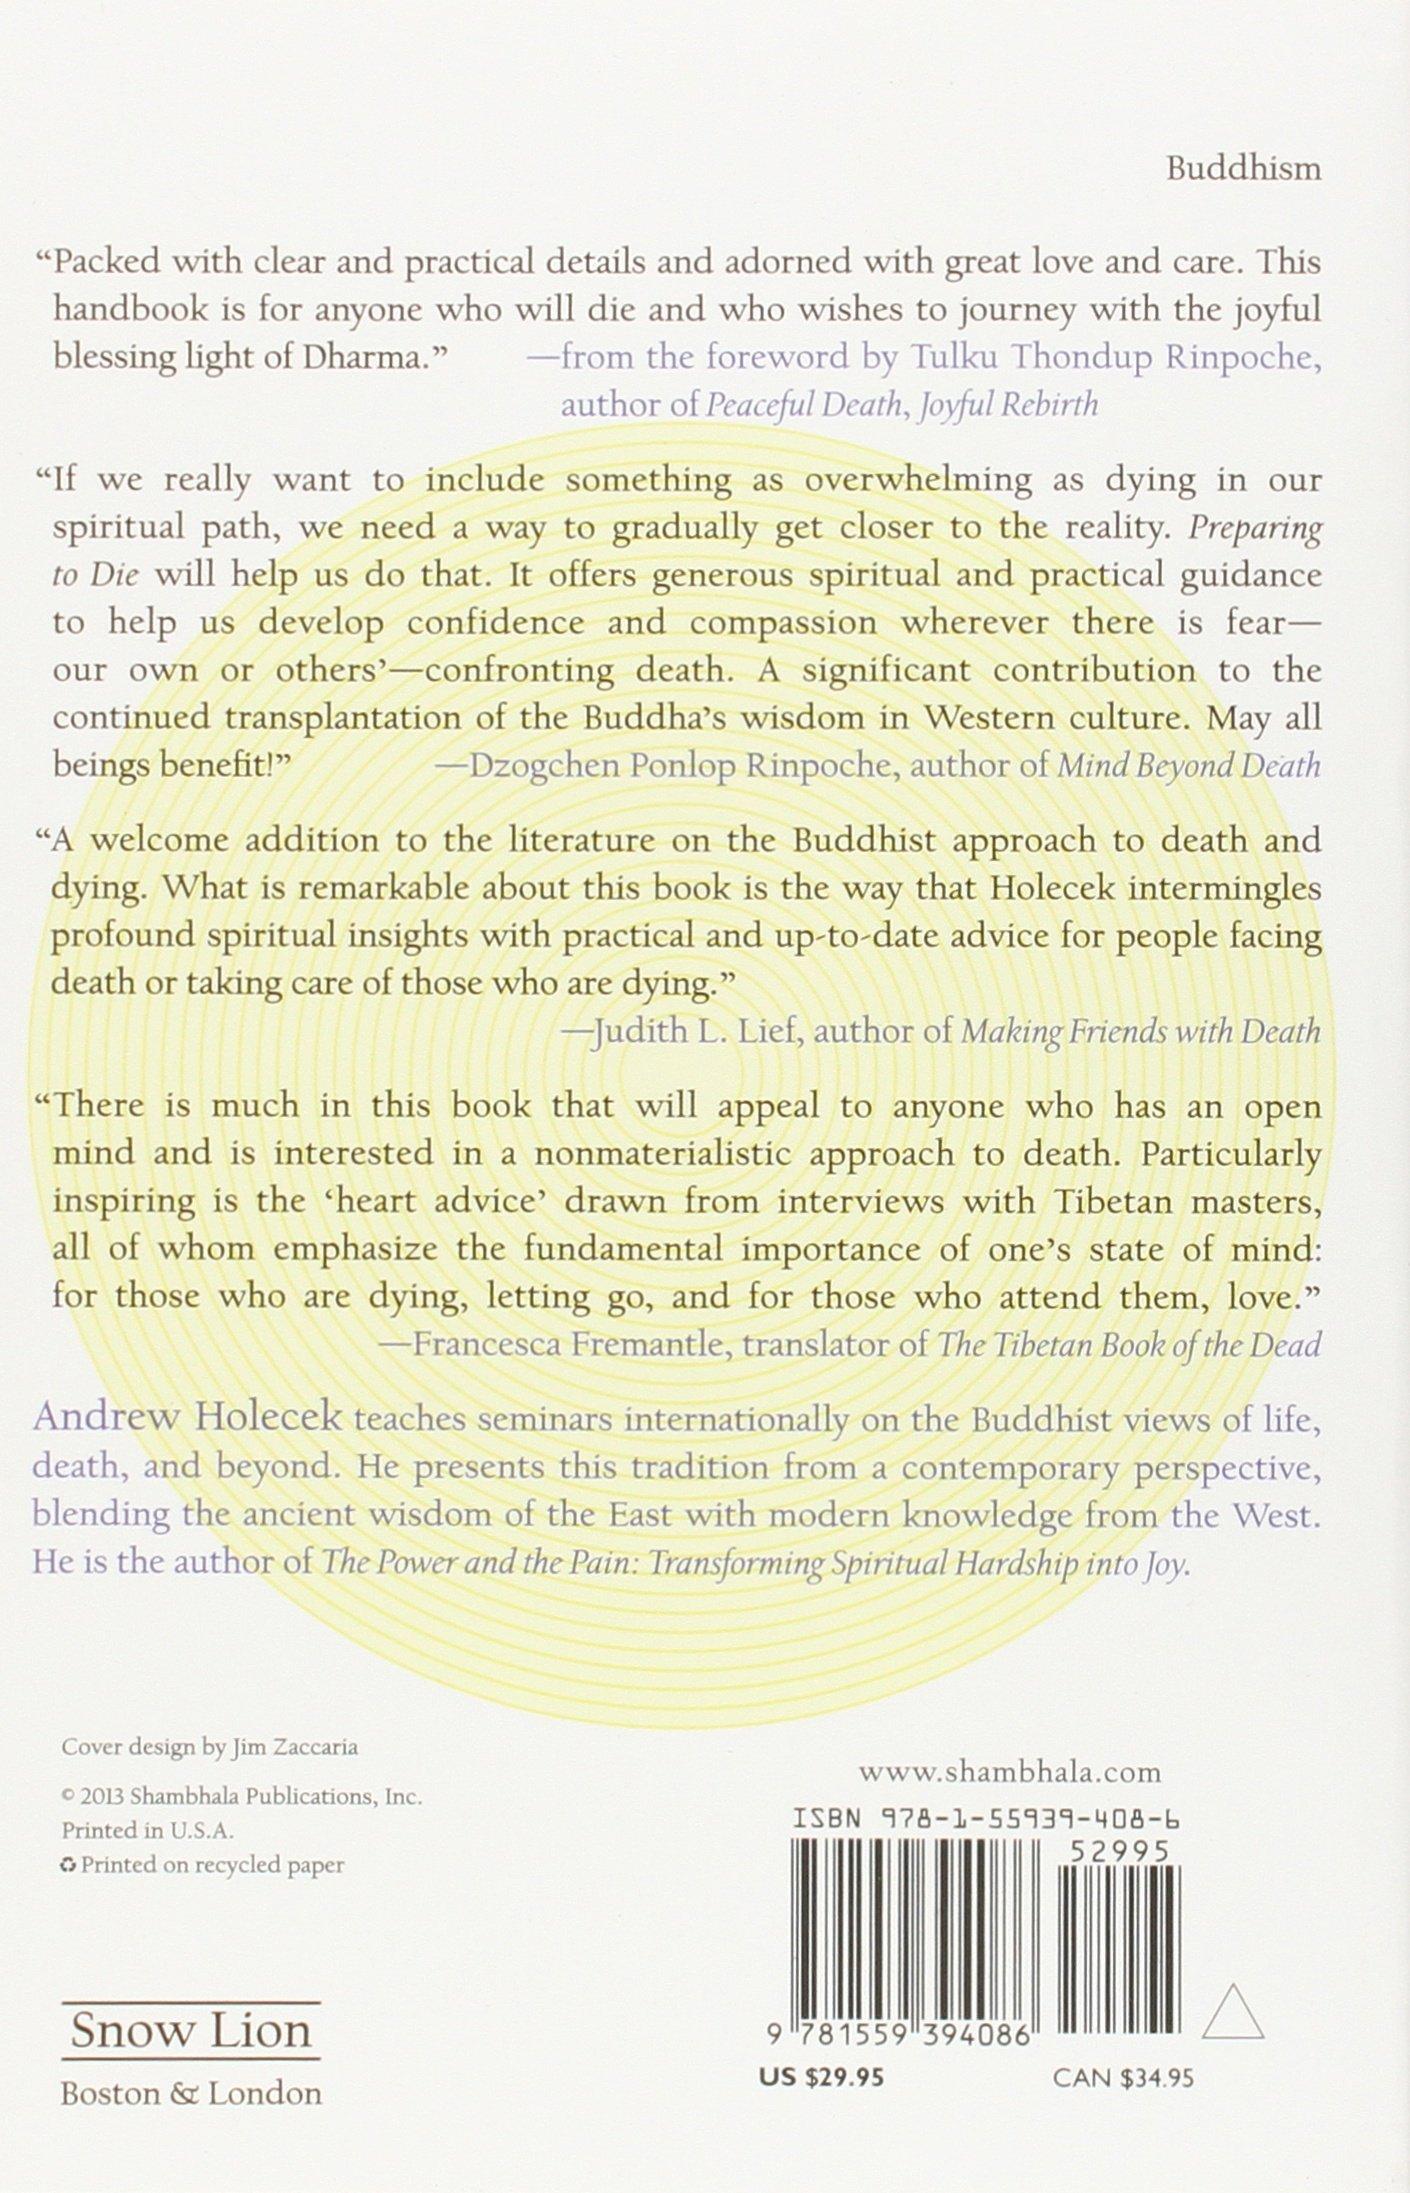 Preparing To Die: Practical Advice And Spiritual Wisdom From The Tibetan  Buddhist Tradition: Andrew Holecek: 9781559394086: Amazon: Books